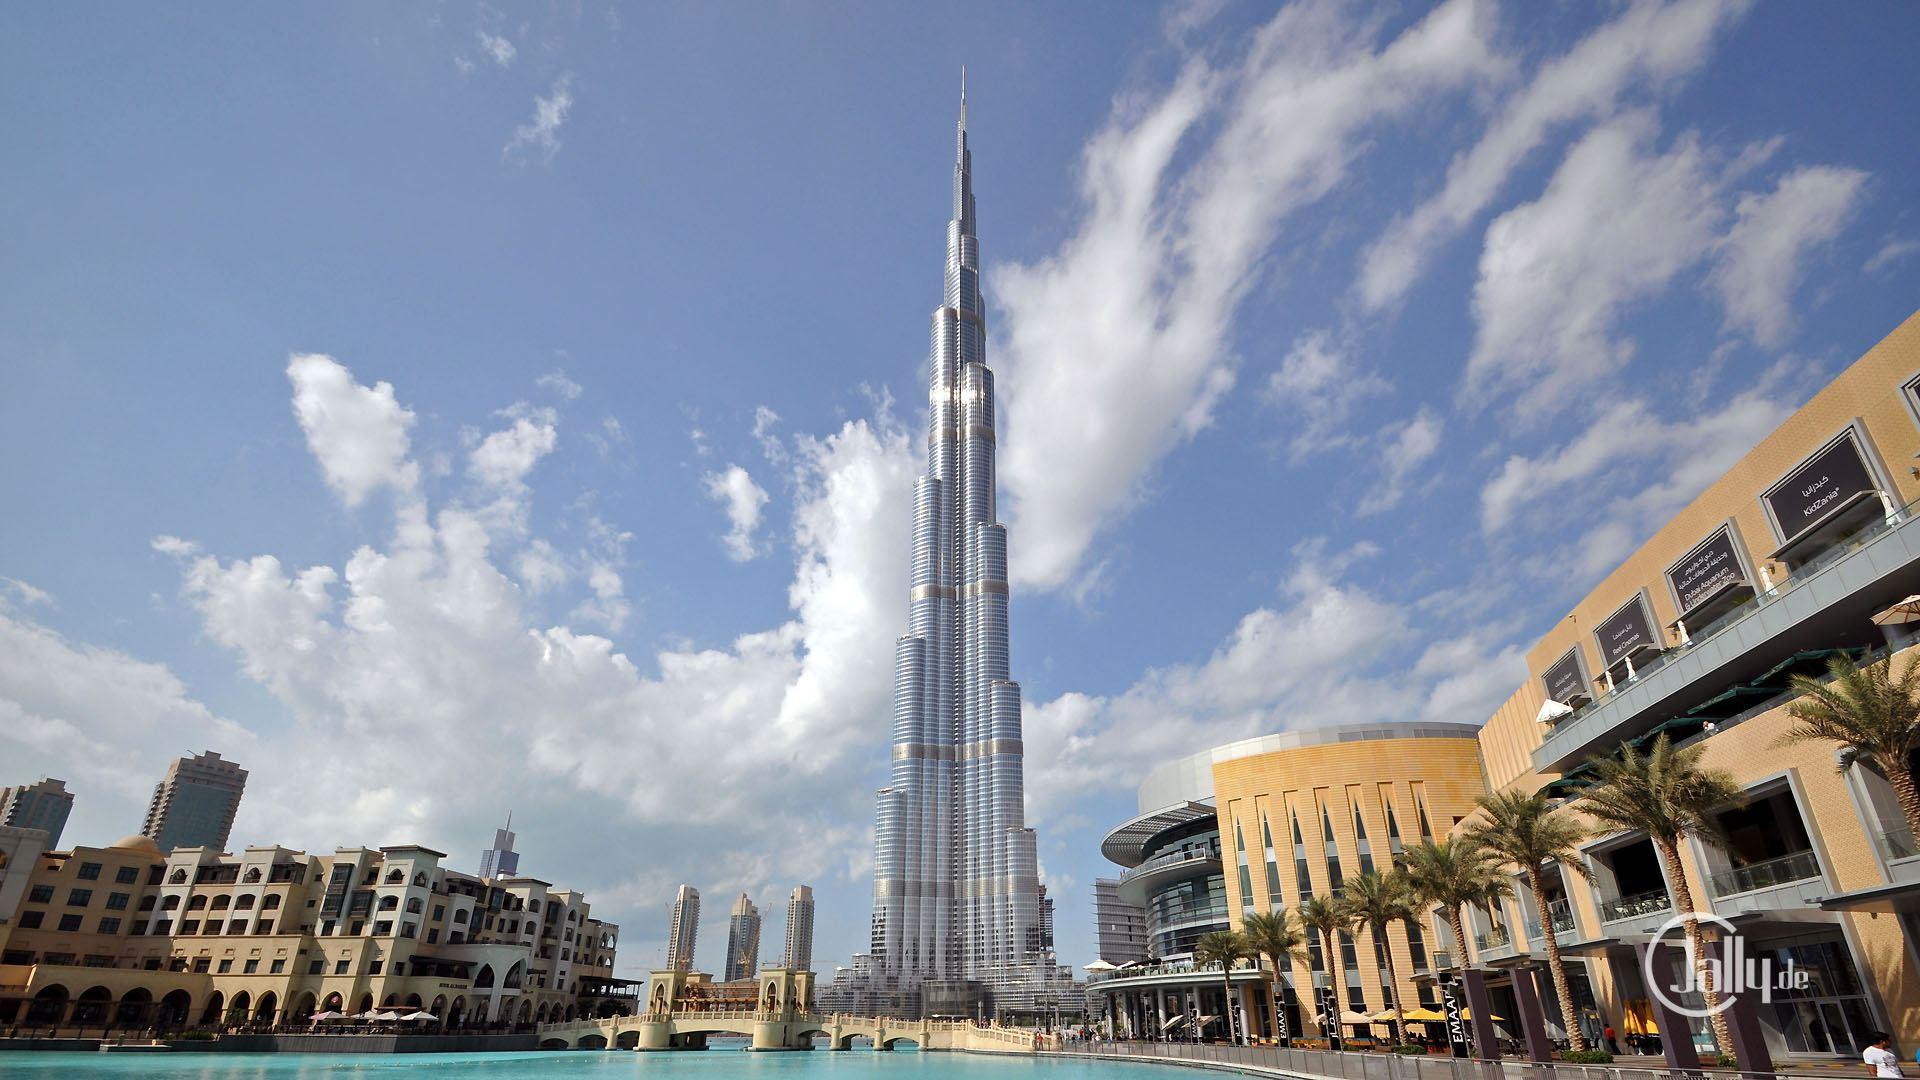 Burj Khalifa Background